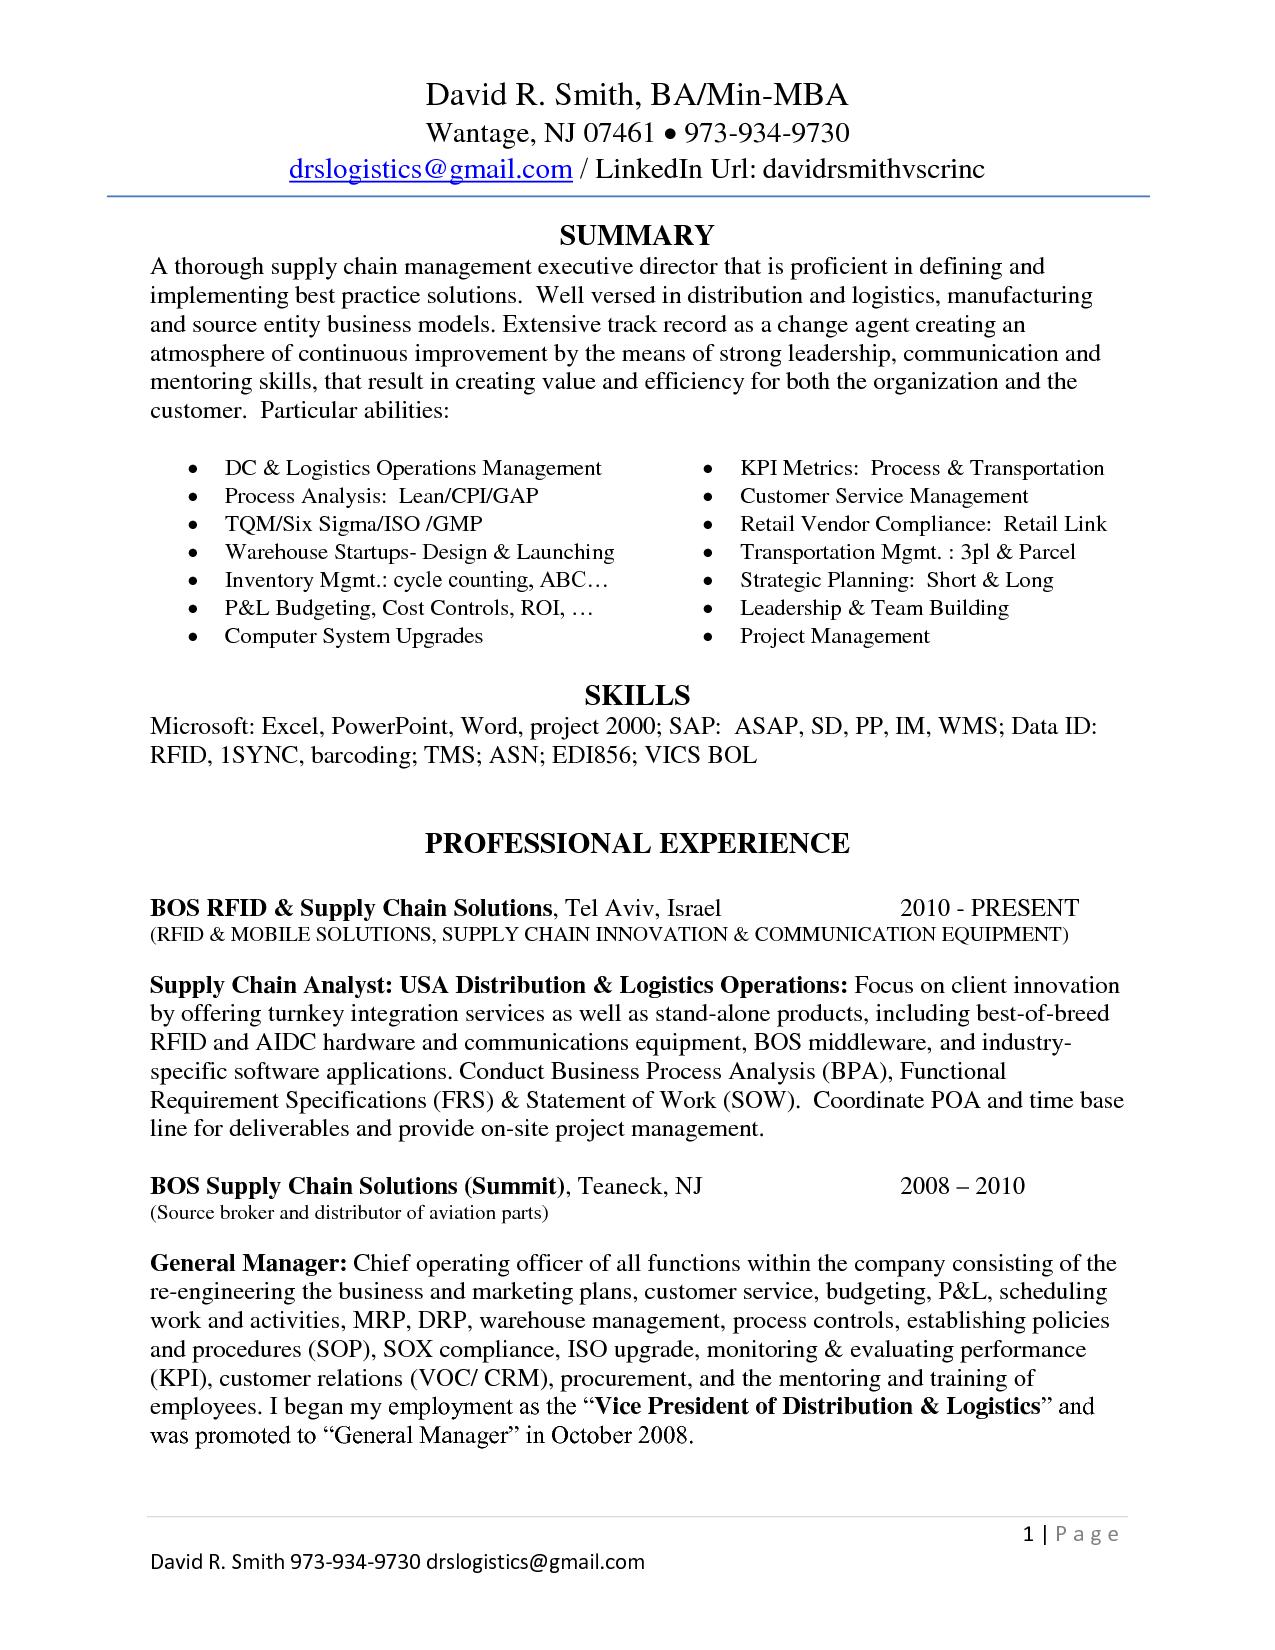 Online Resume Builder Linkedin